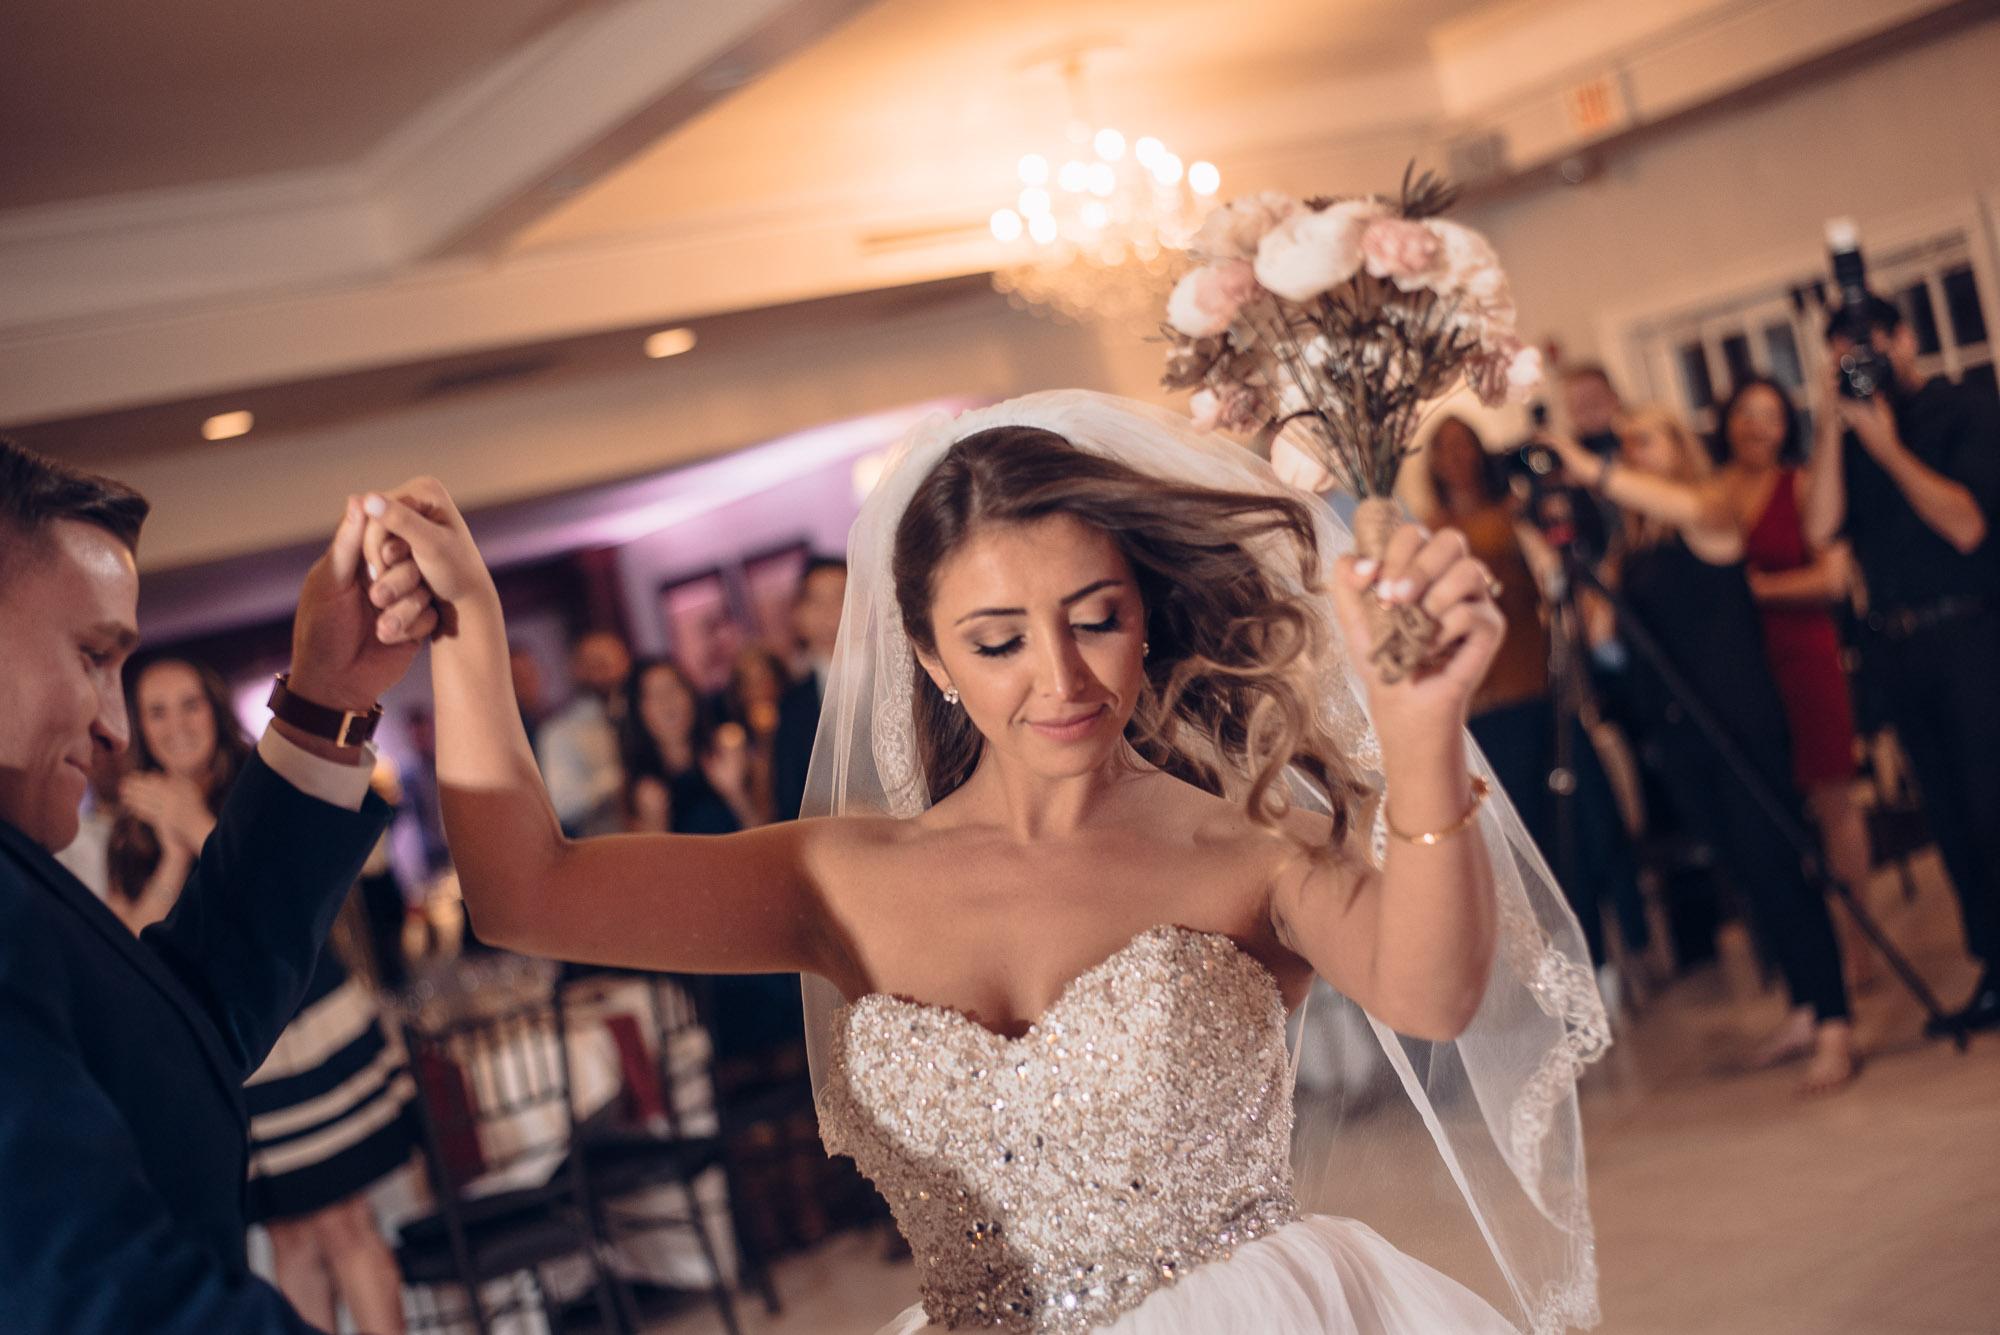 woodwinds_wedding_171020_web-45.jpg